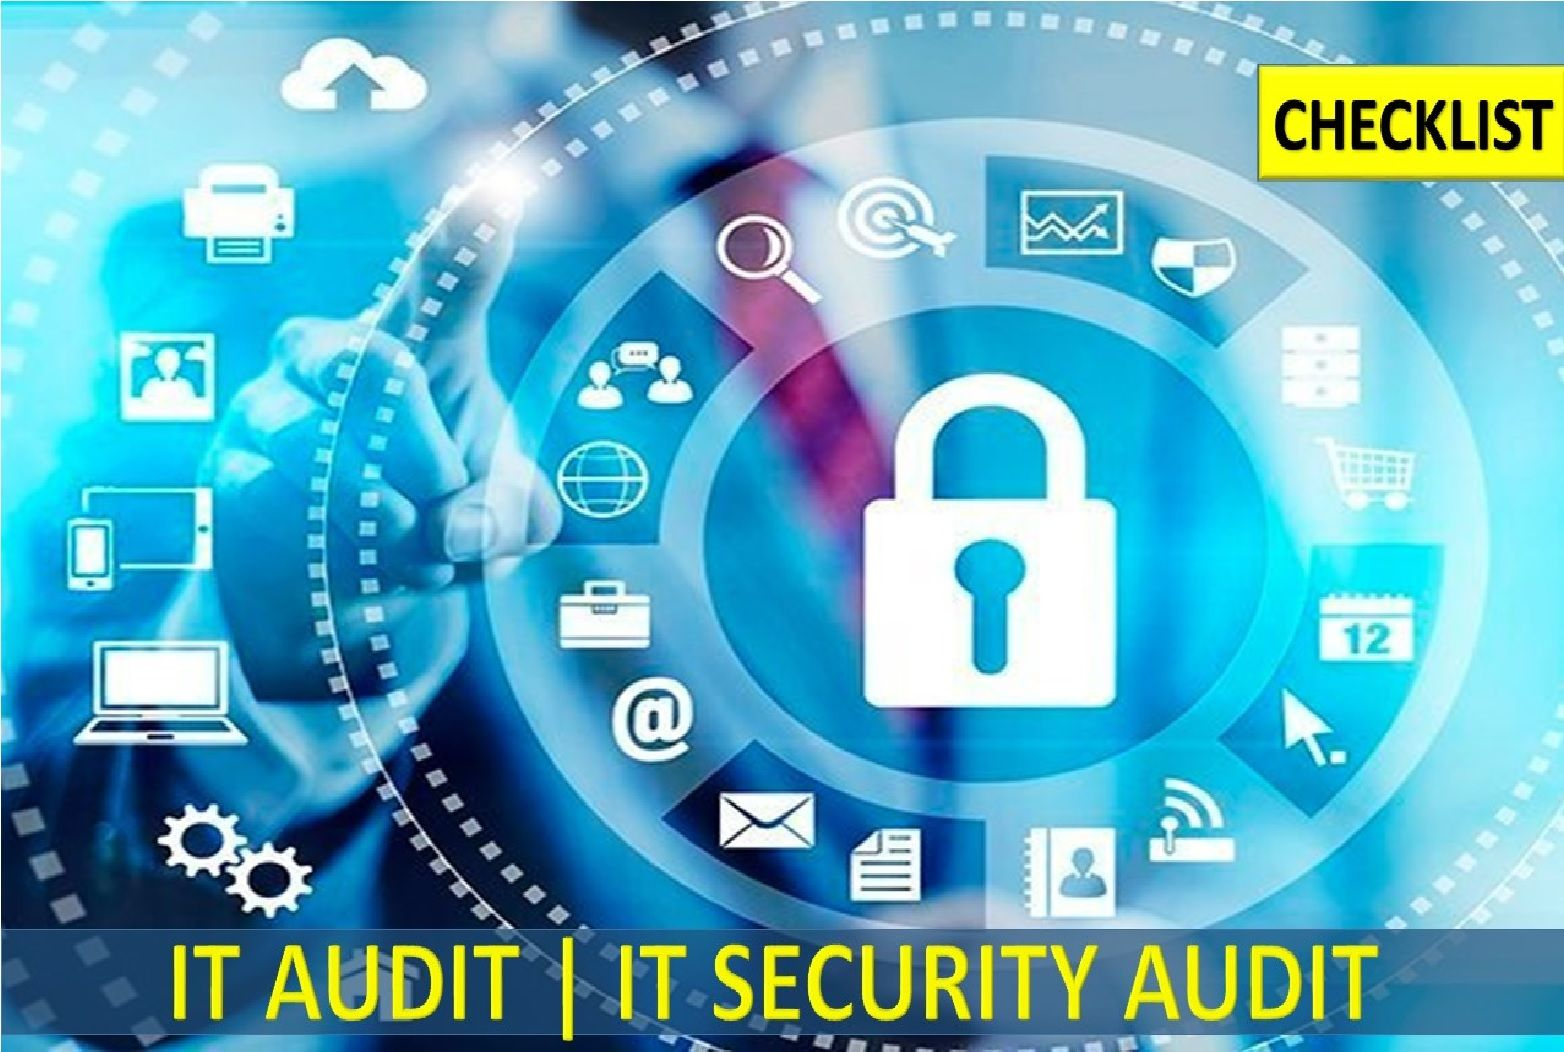 IT Security IT Audit IT Security Audit IT security